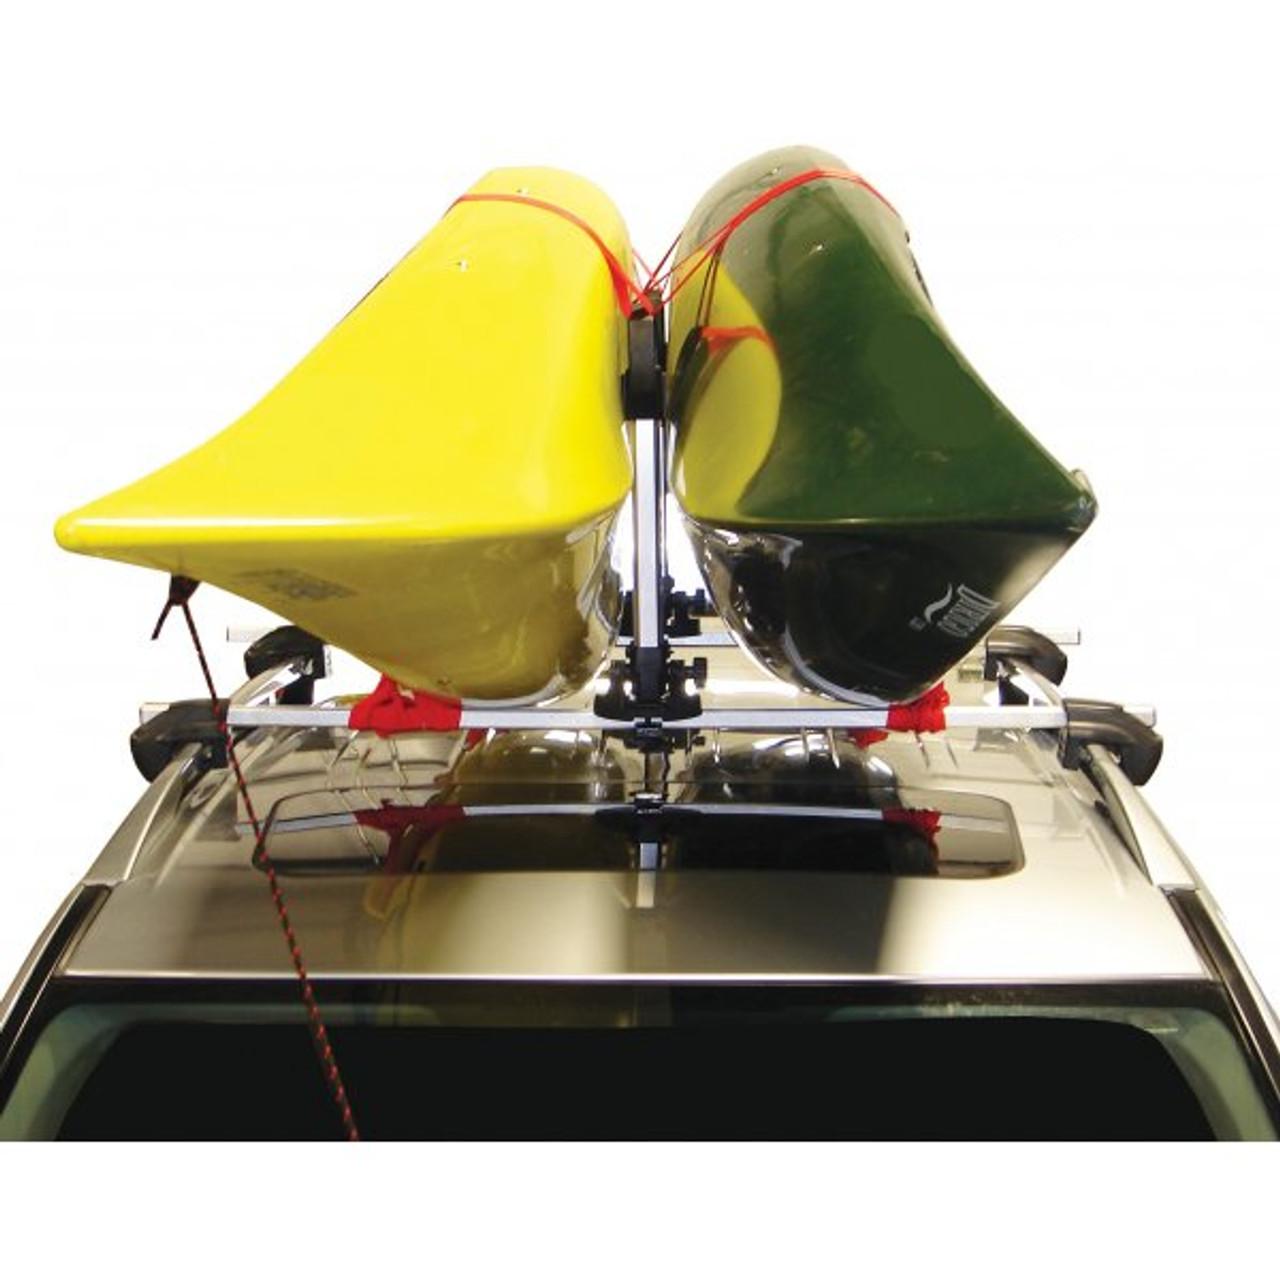 Double Kayak Roof Rack Holds 2 Kayaks Storeyourboard Com